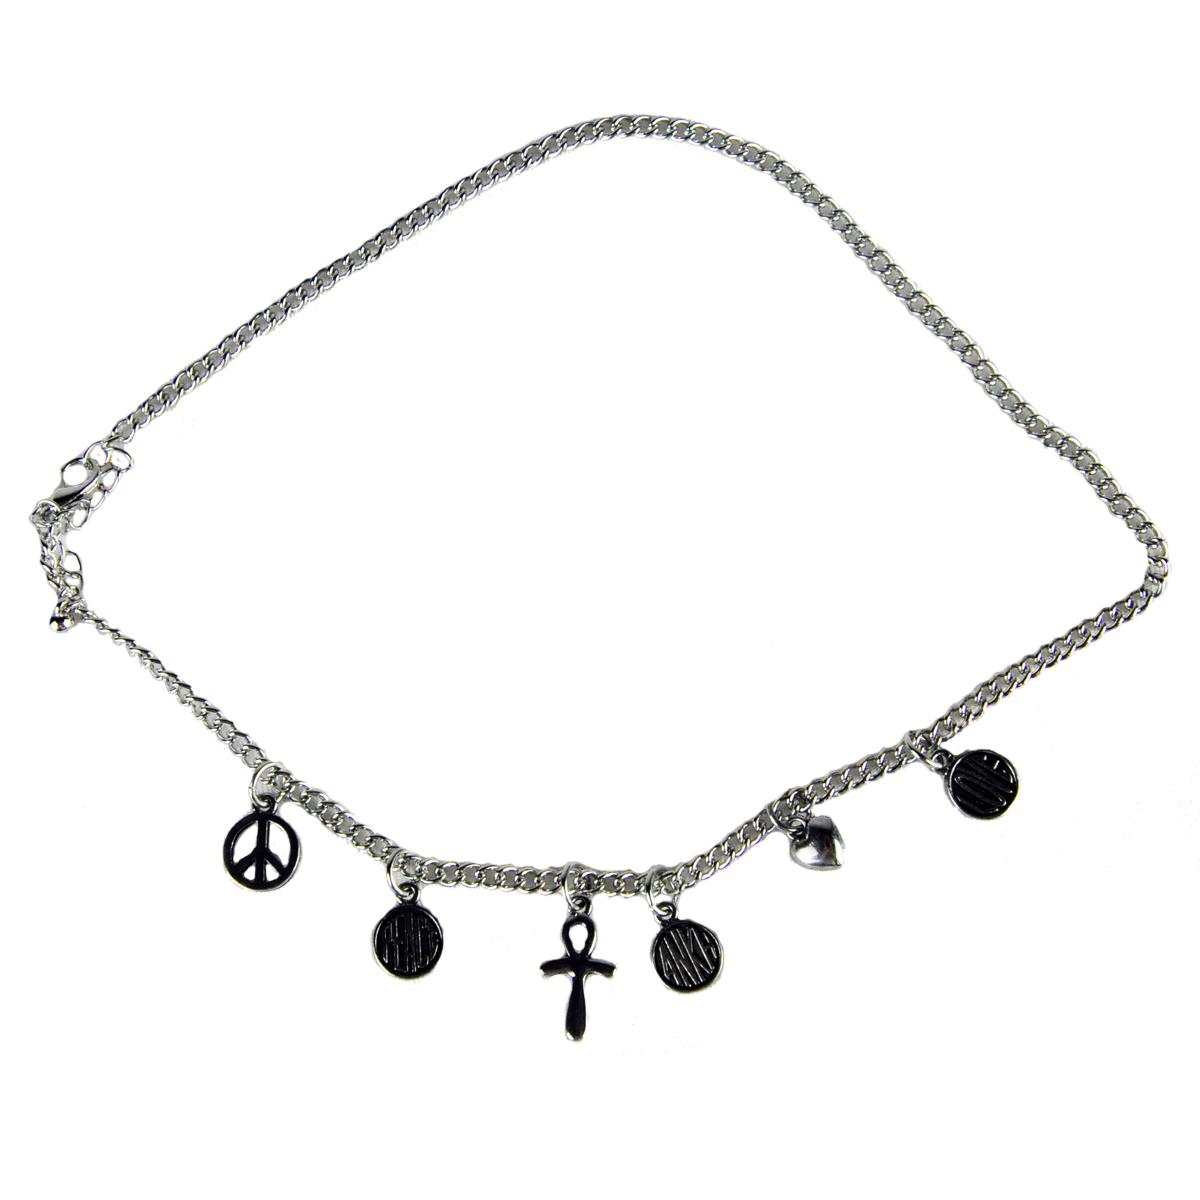 Peace Ankh Amp Heart Chain Necklace Rastaempire